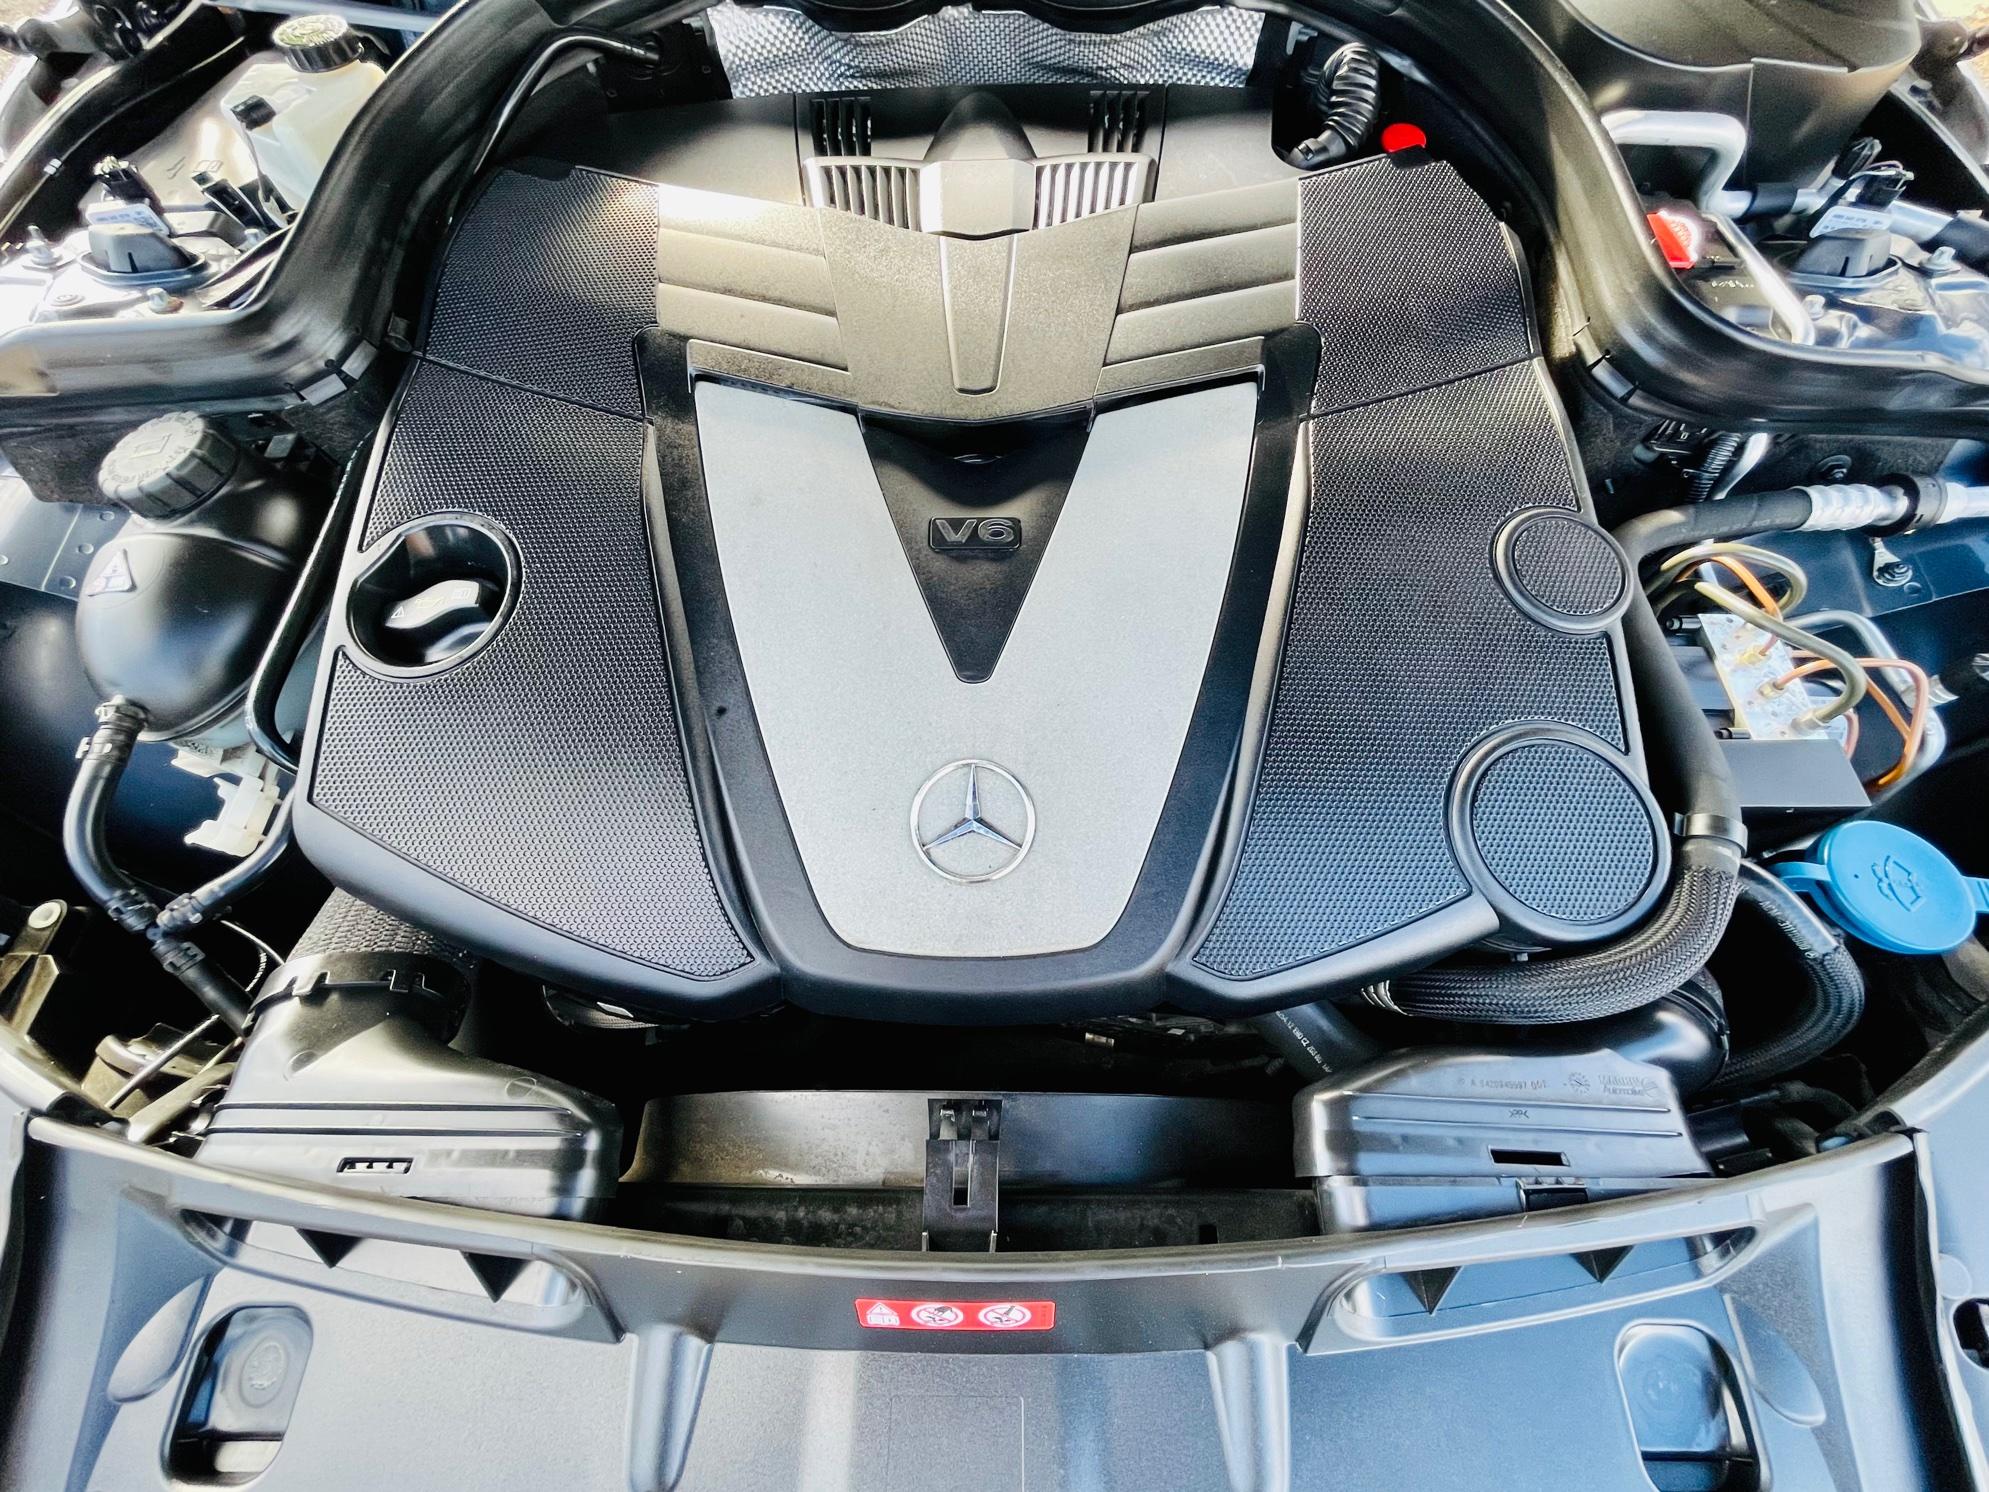 Car For Sale Mercedes C-Class - KP58ZHH Sixers Group Image #9